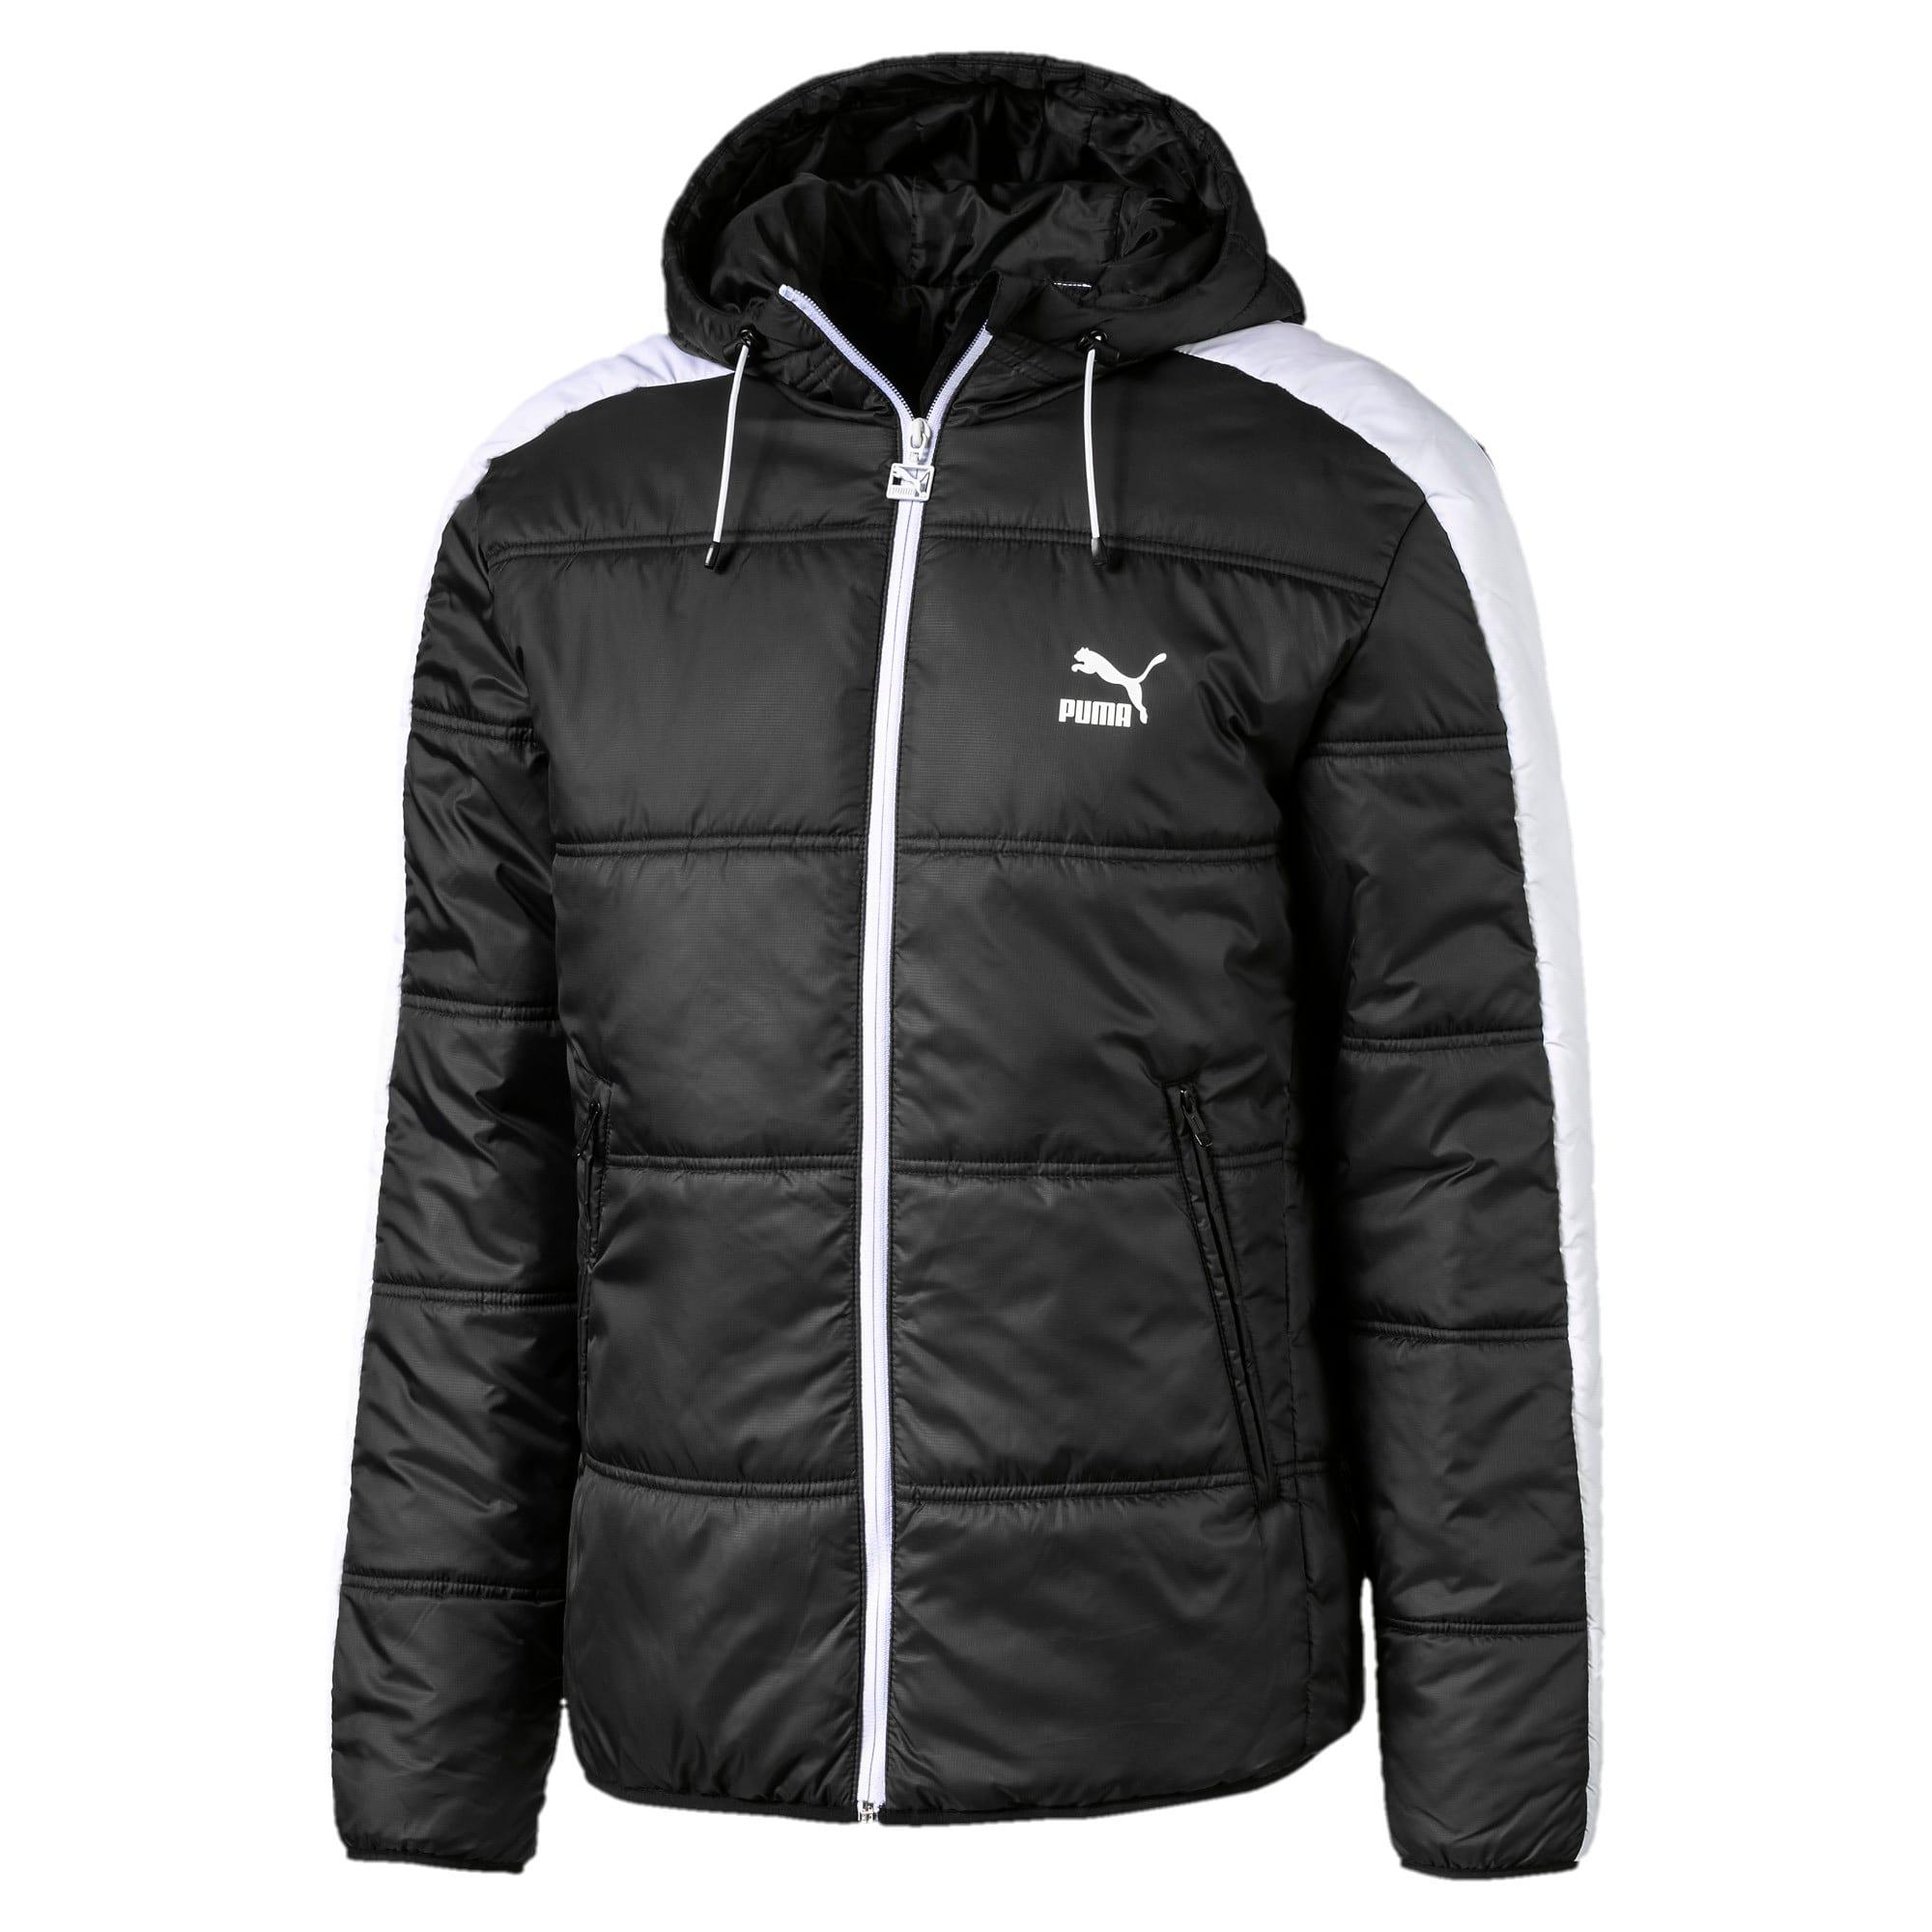 Thumbnail 1 of Classics T7 Padded Men's Jacket, Puma Black, medium